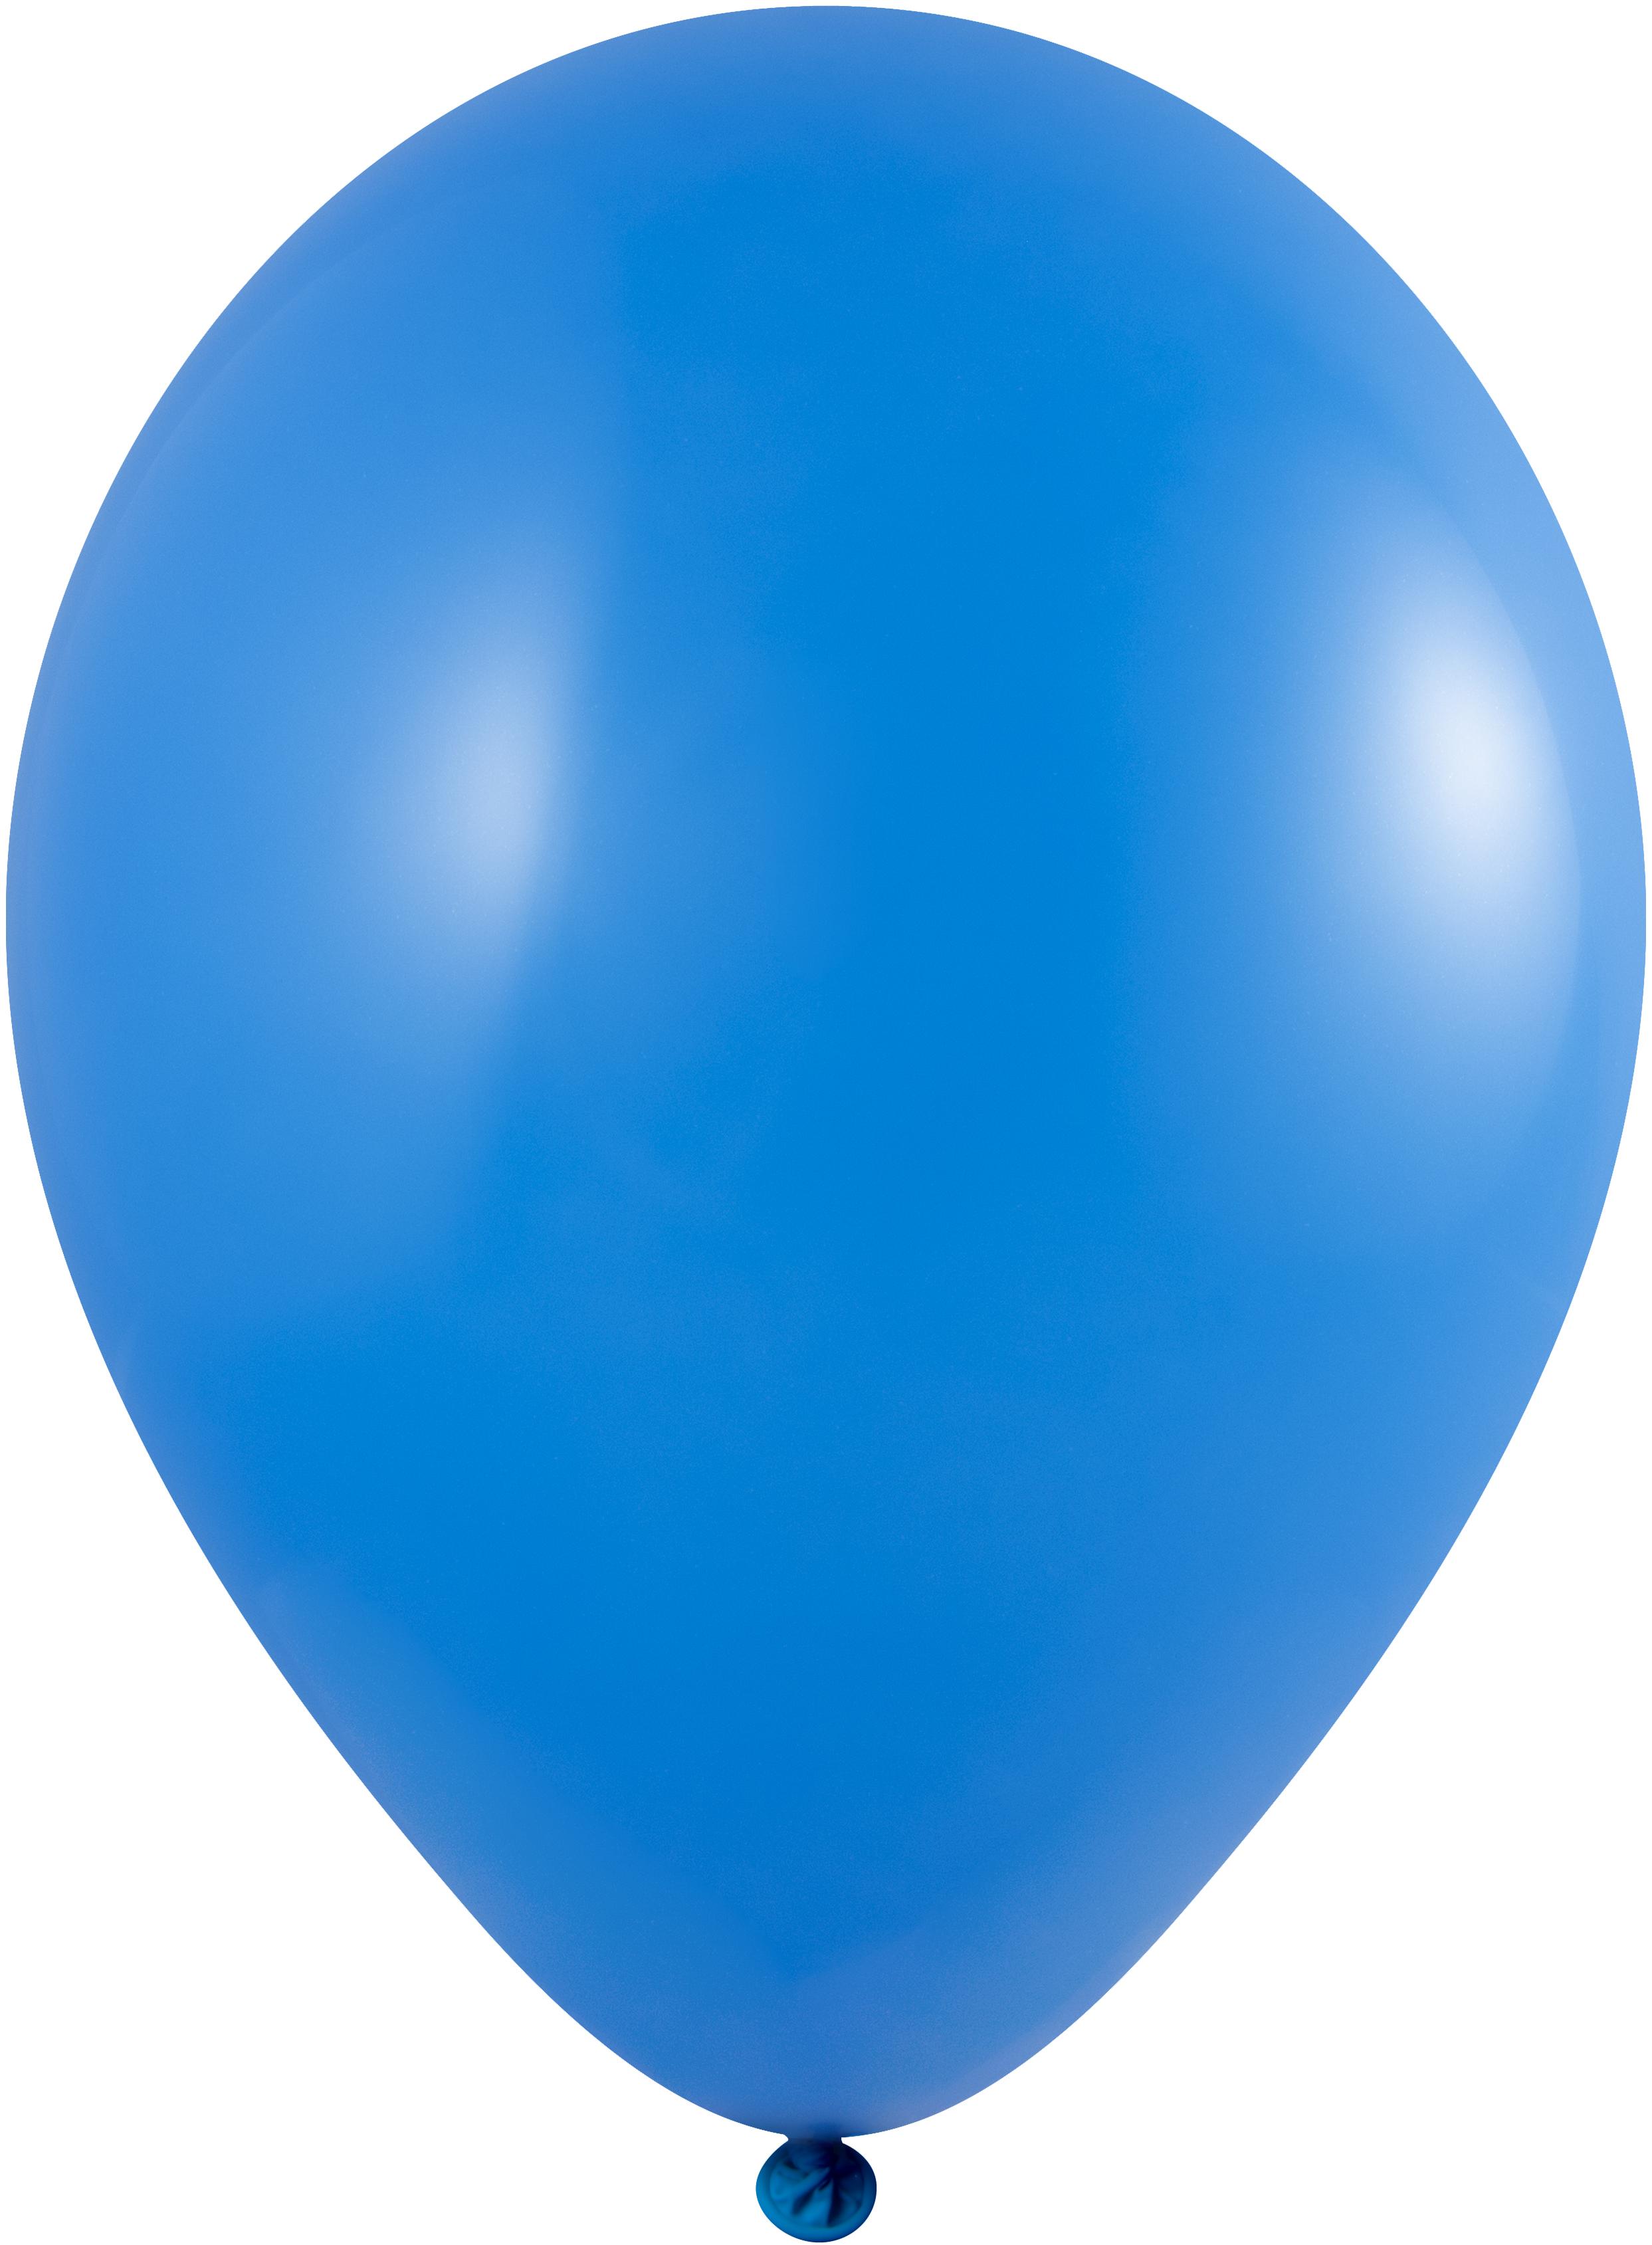 Bedrukte ballonnen in Qualityprint zeefdruk